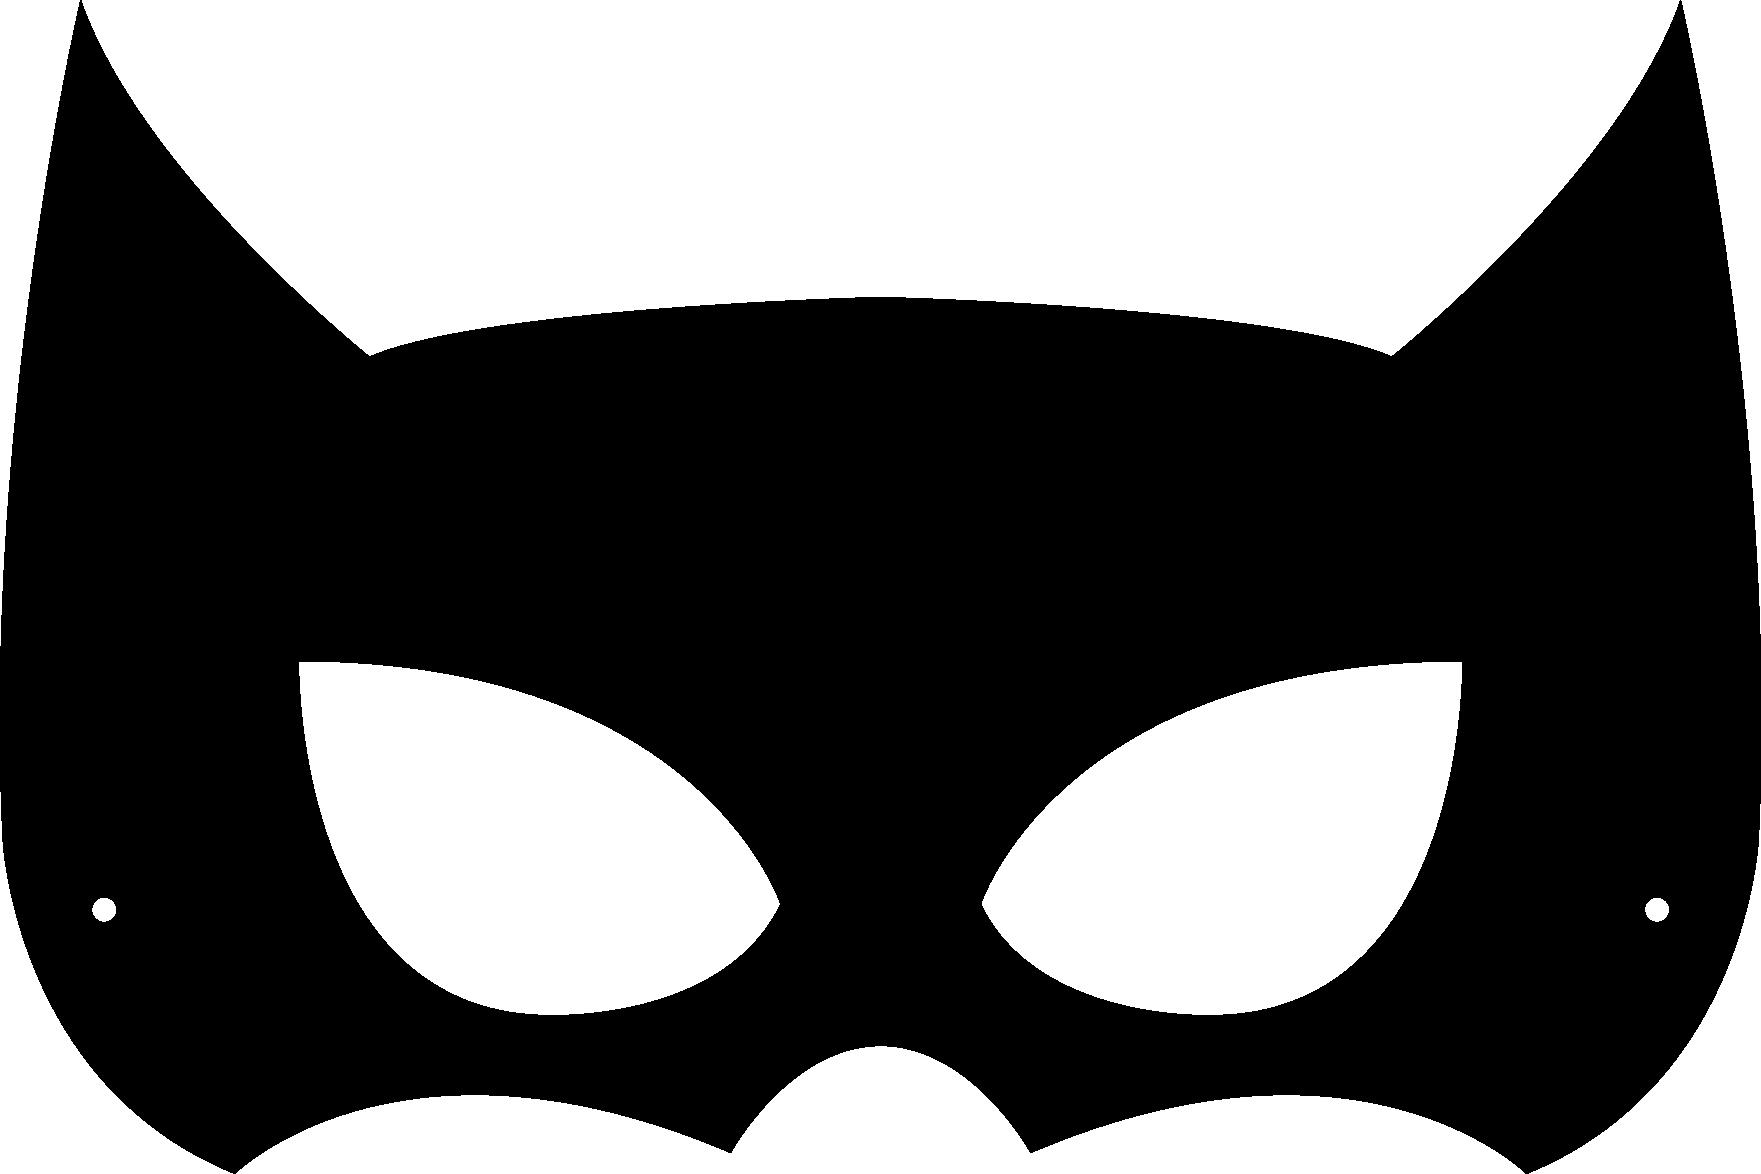 Mask clipart batman mask Incredibles Halloween Masks Printable Mask